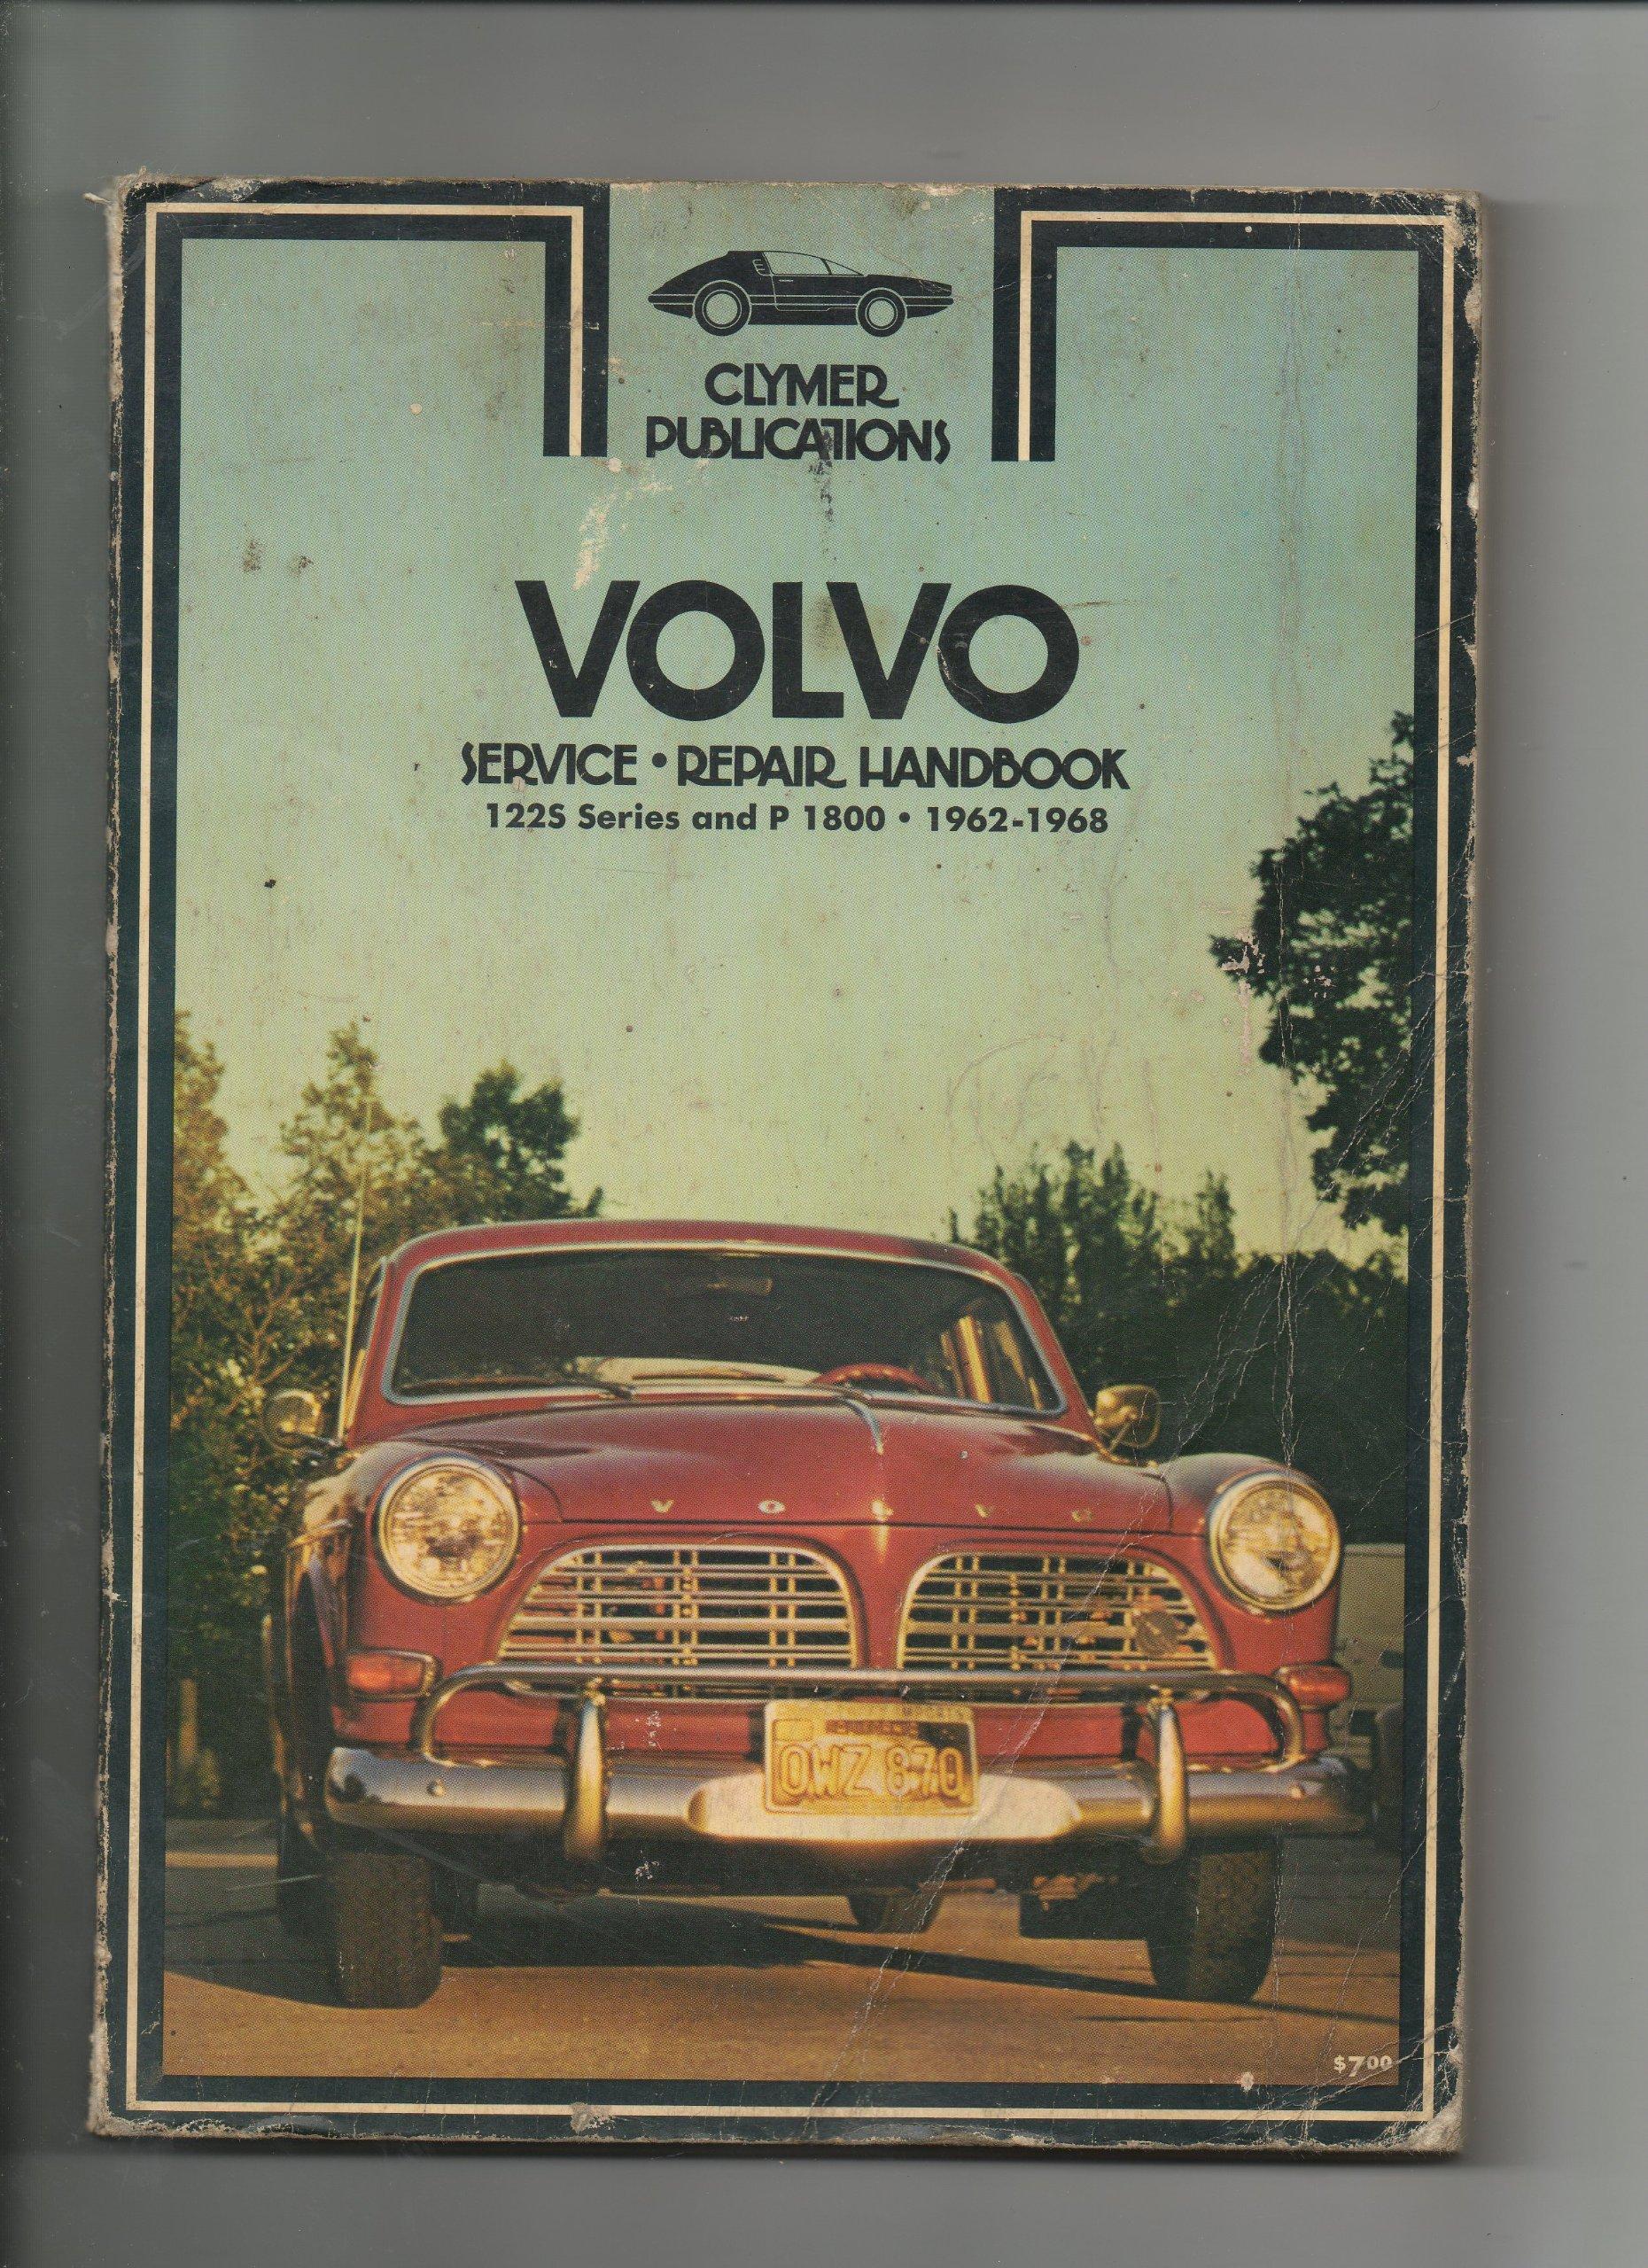 Volvo Service Repair Handbook 1225 Series & P 1800 1962 1968